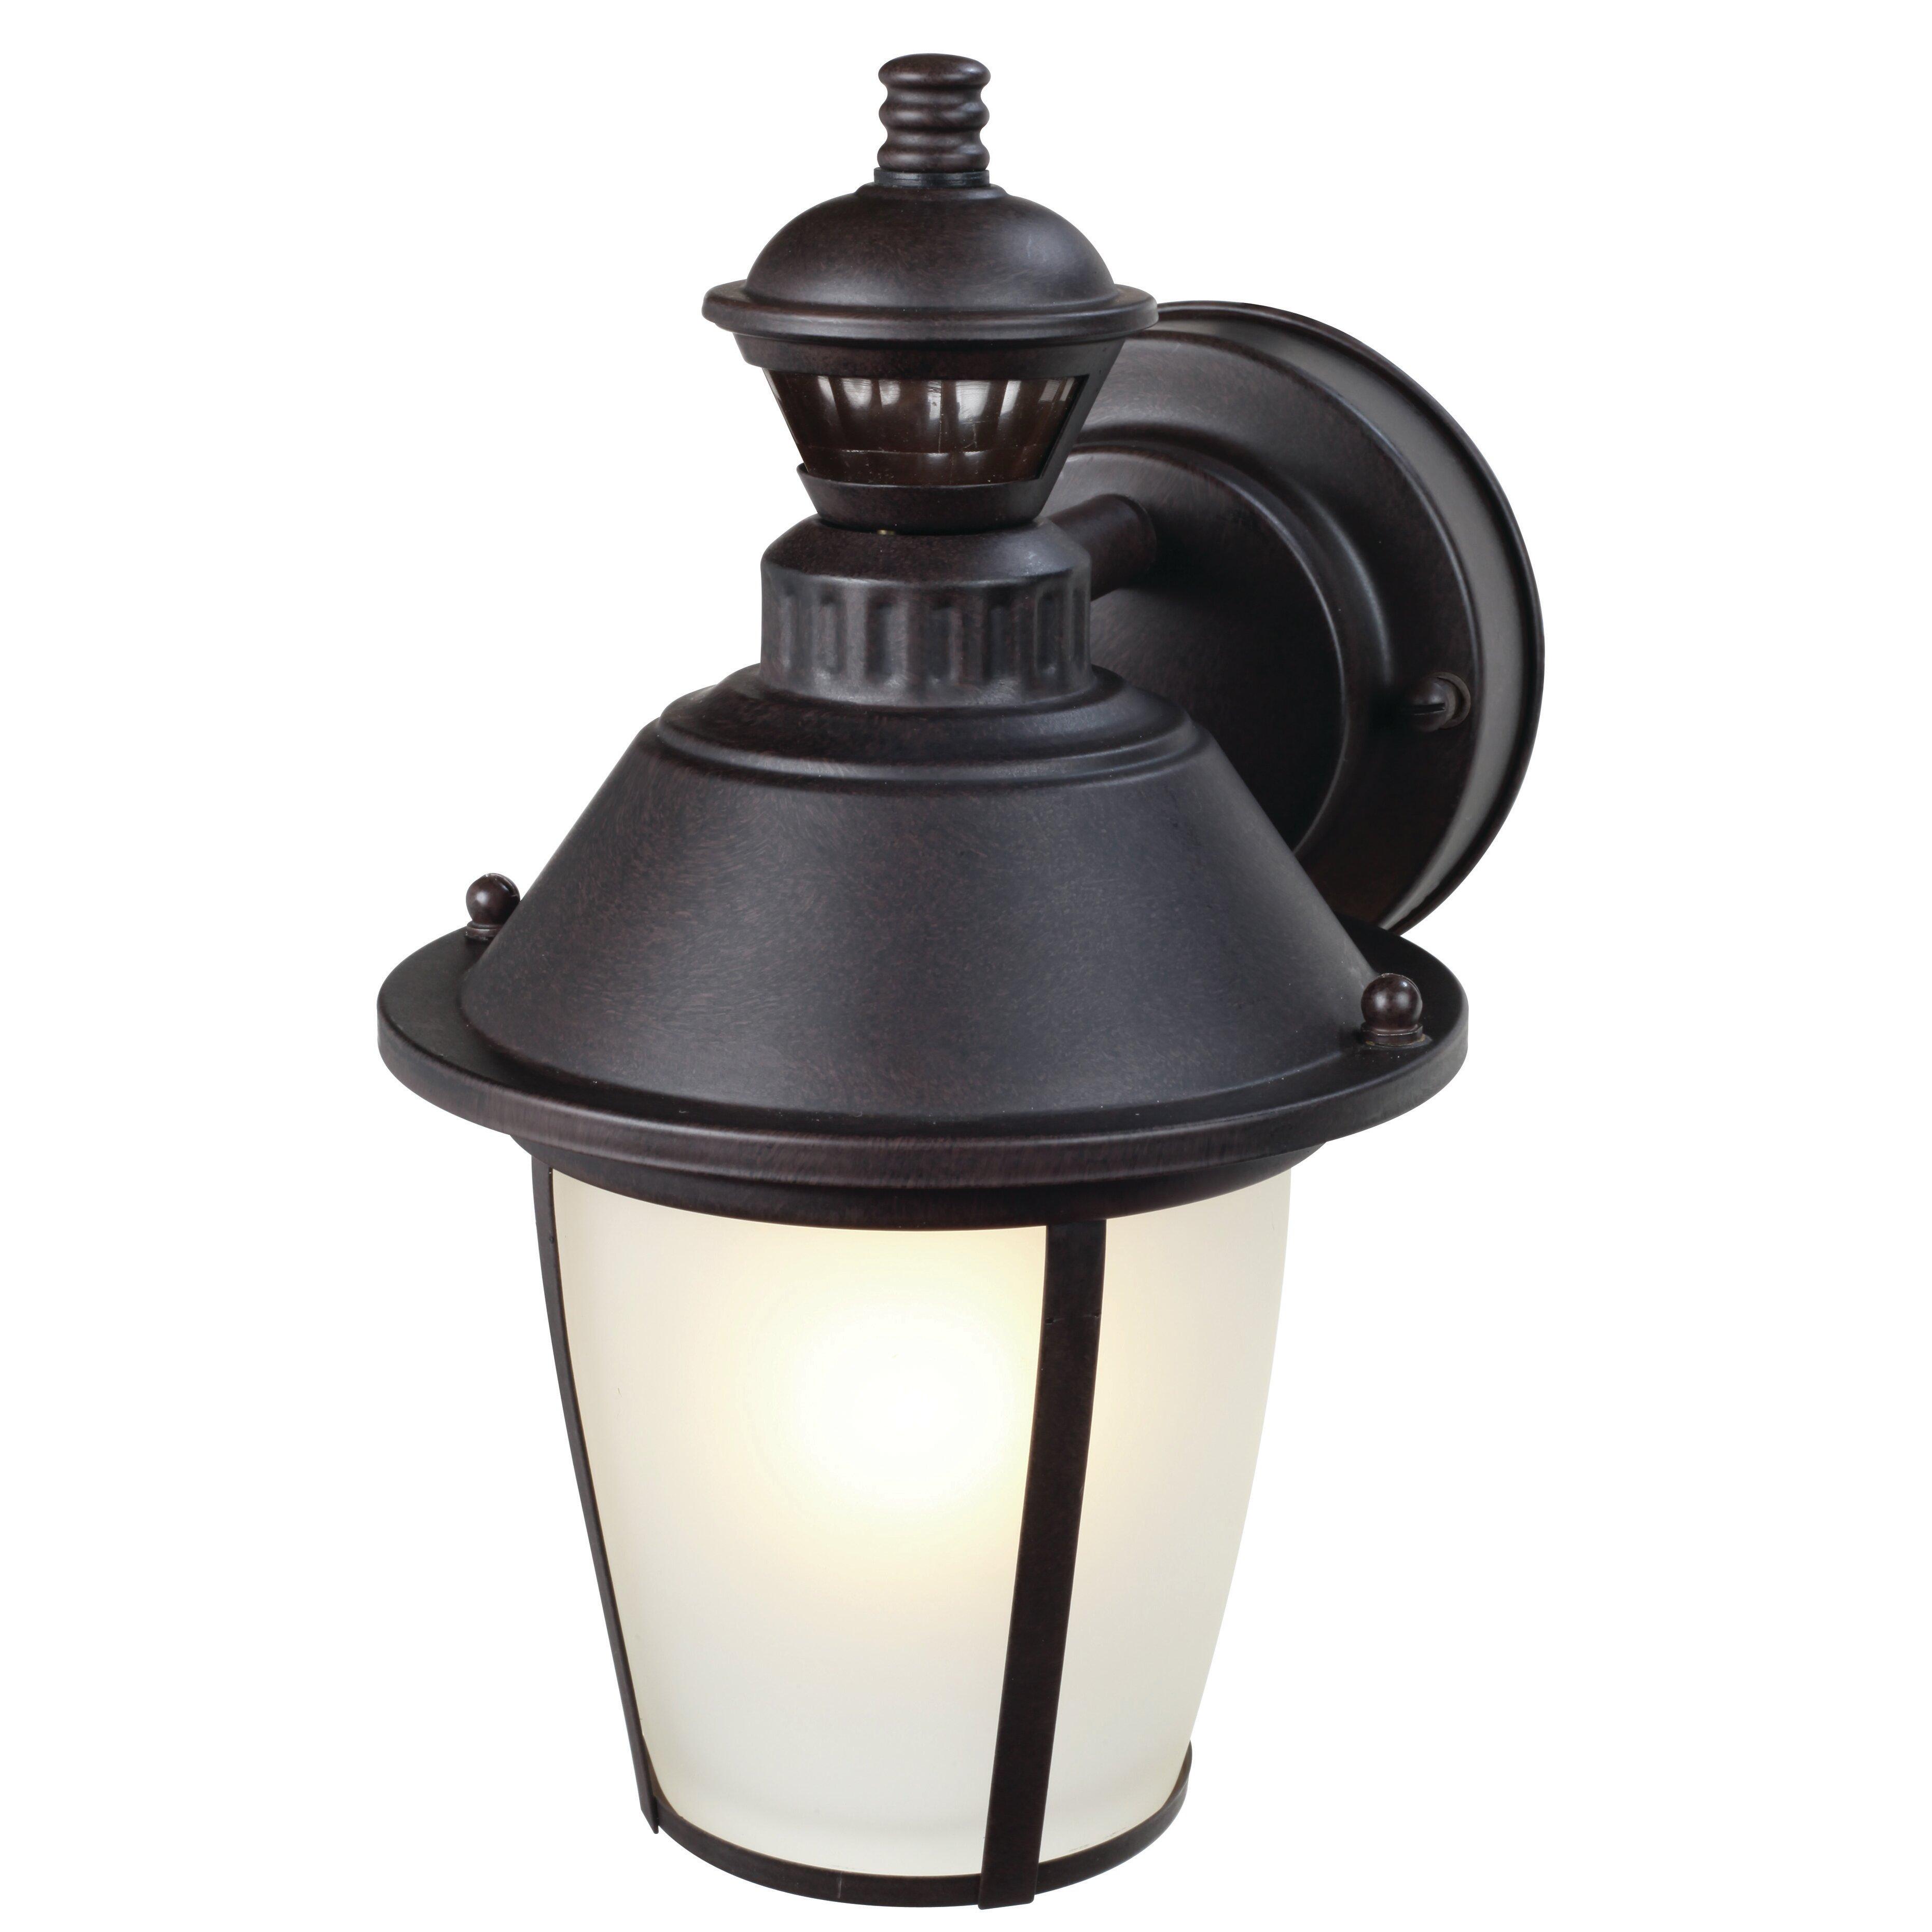 Heath zenith 1 light outdoor wall lantern wayfair for Zenith garden rooms